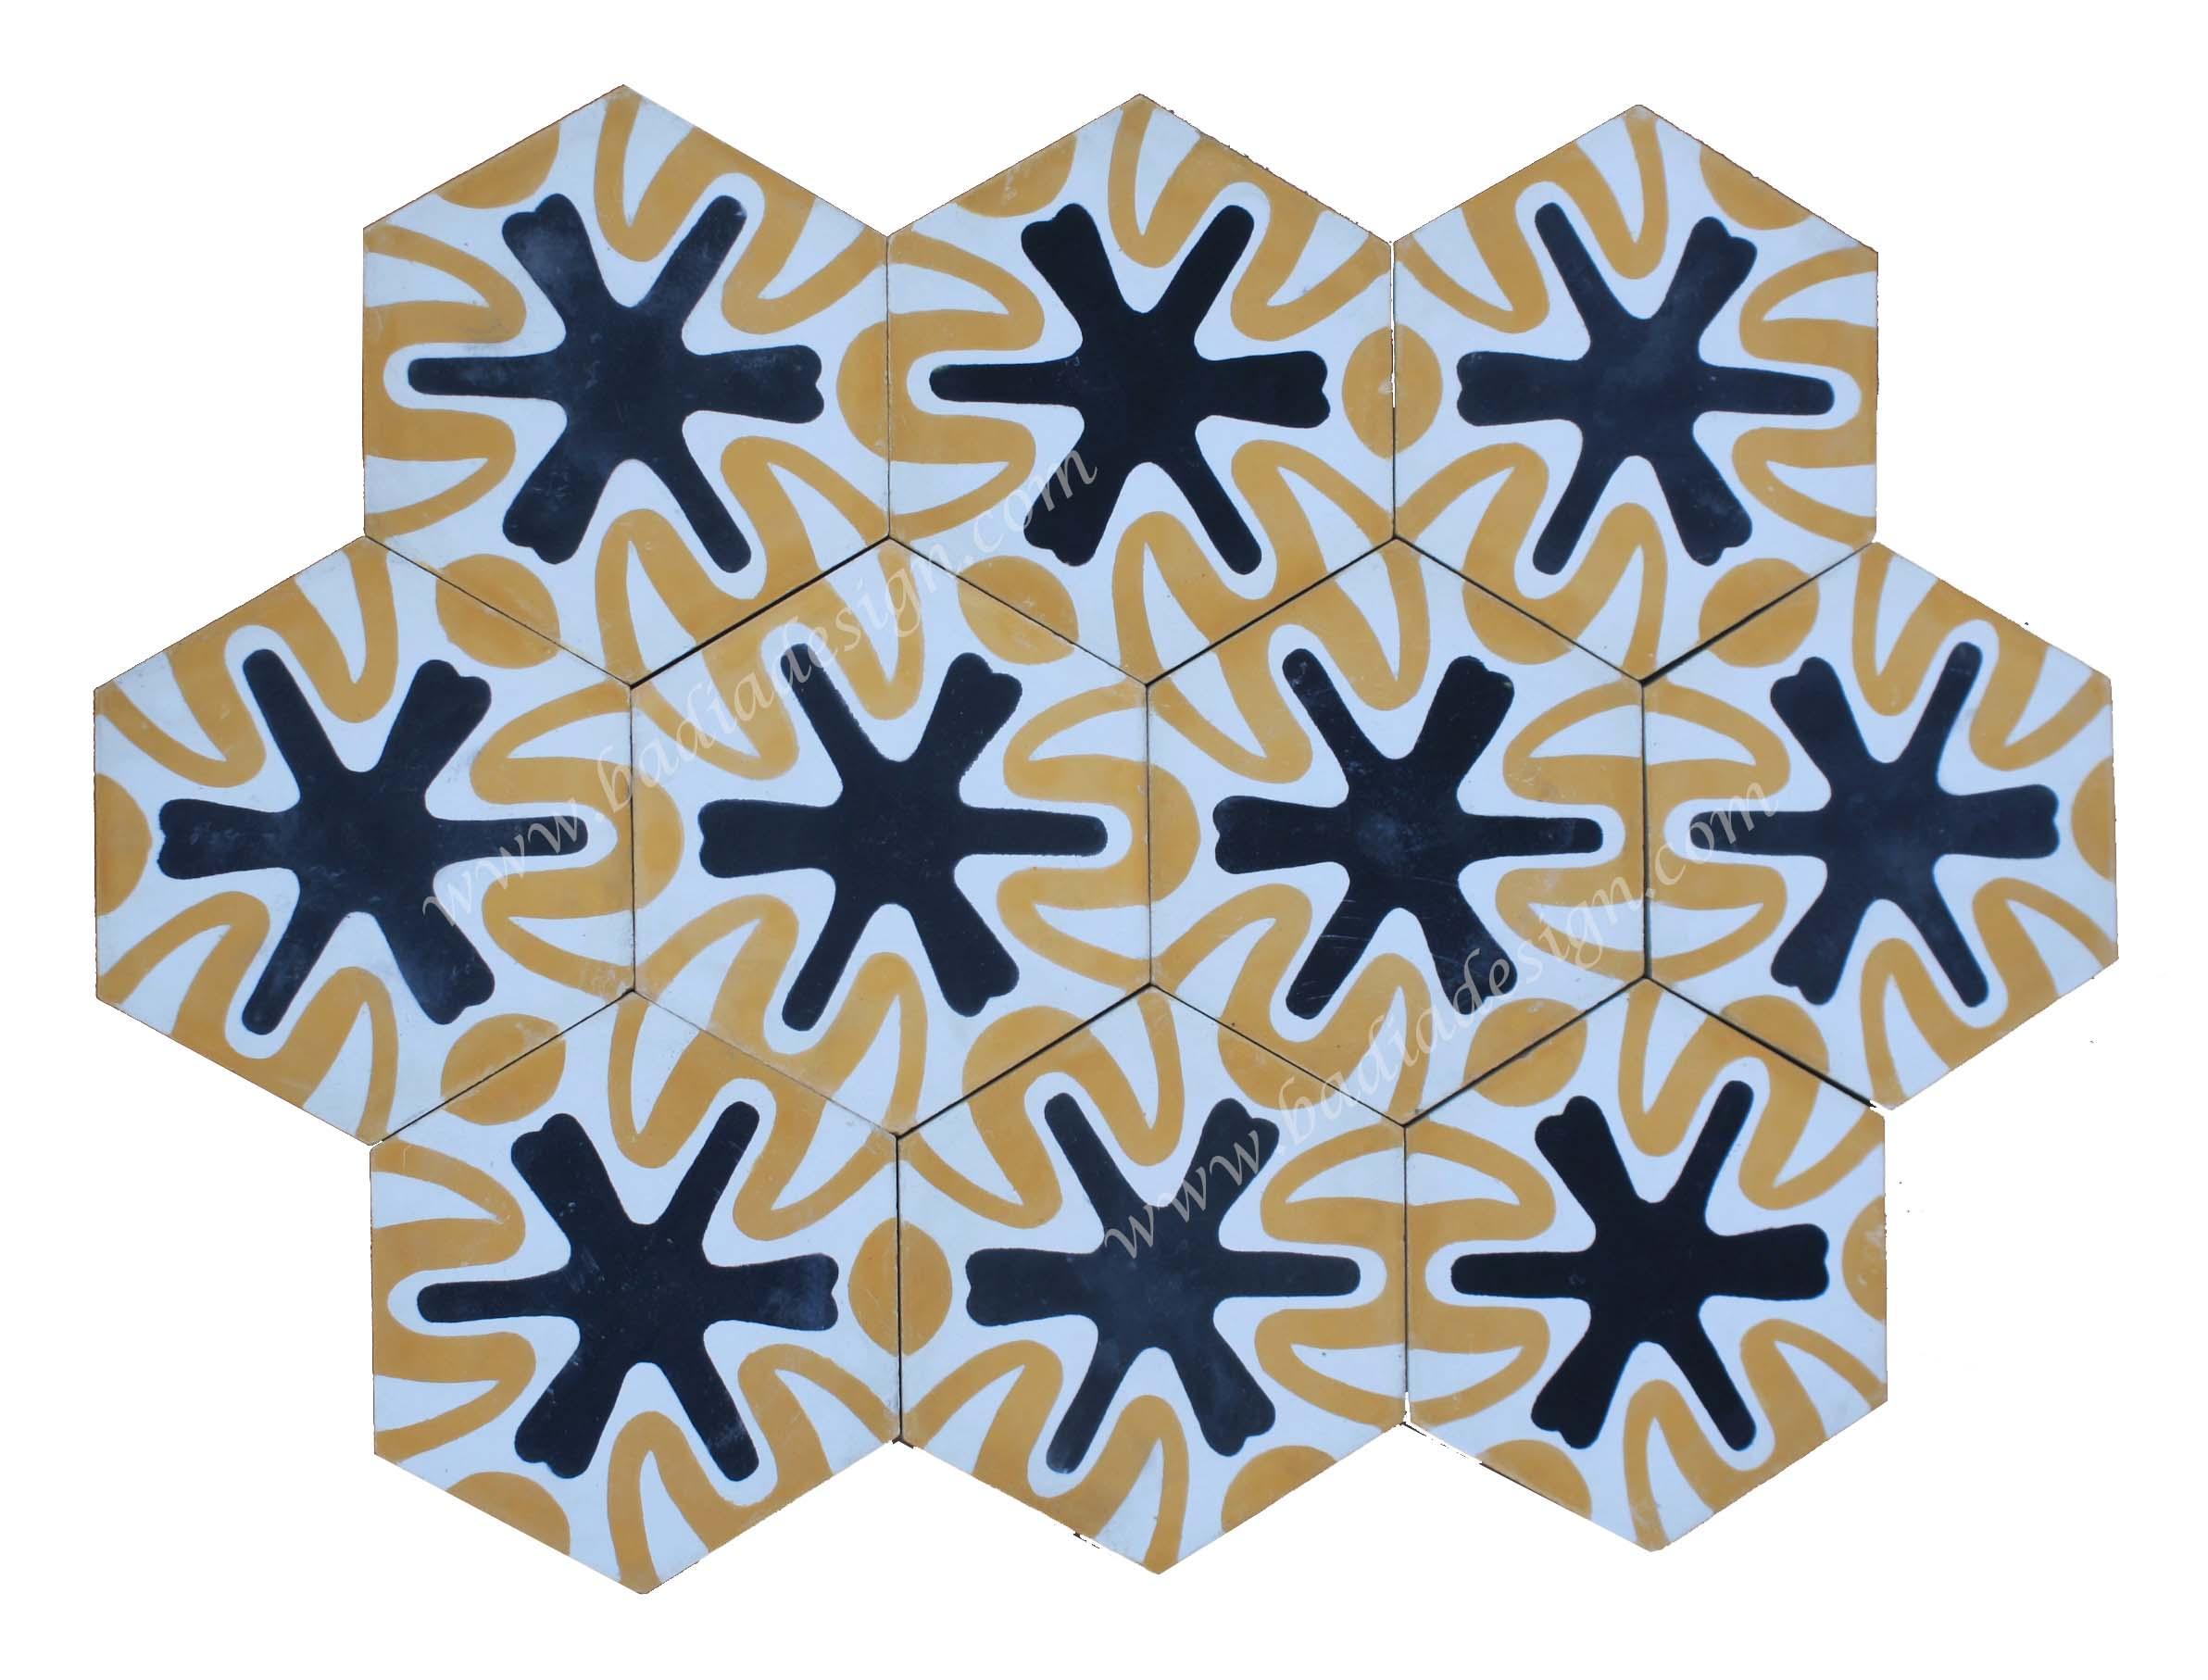 hexagon-shaped-spanish-cement-tile-ct098-1.jpg